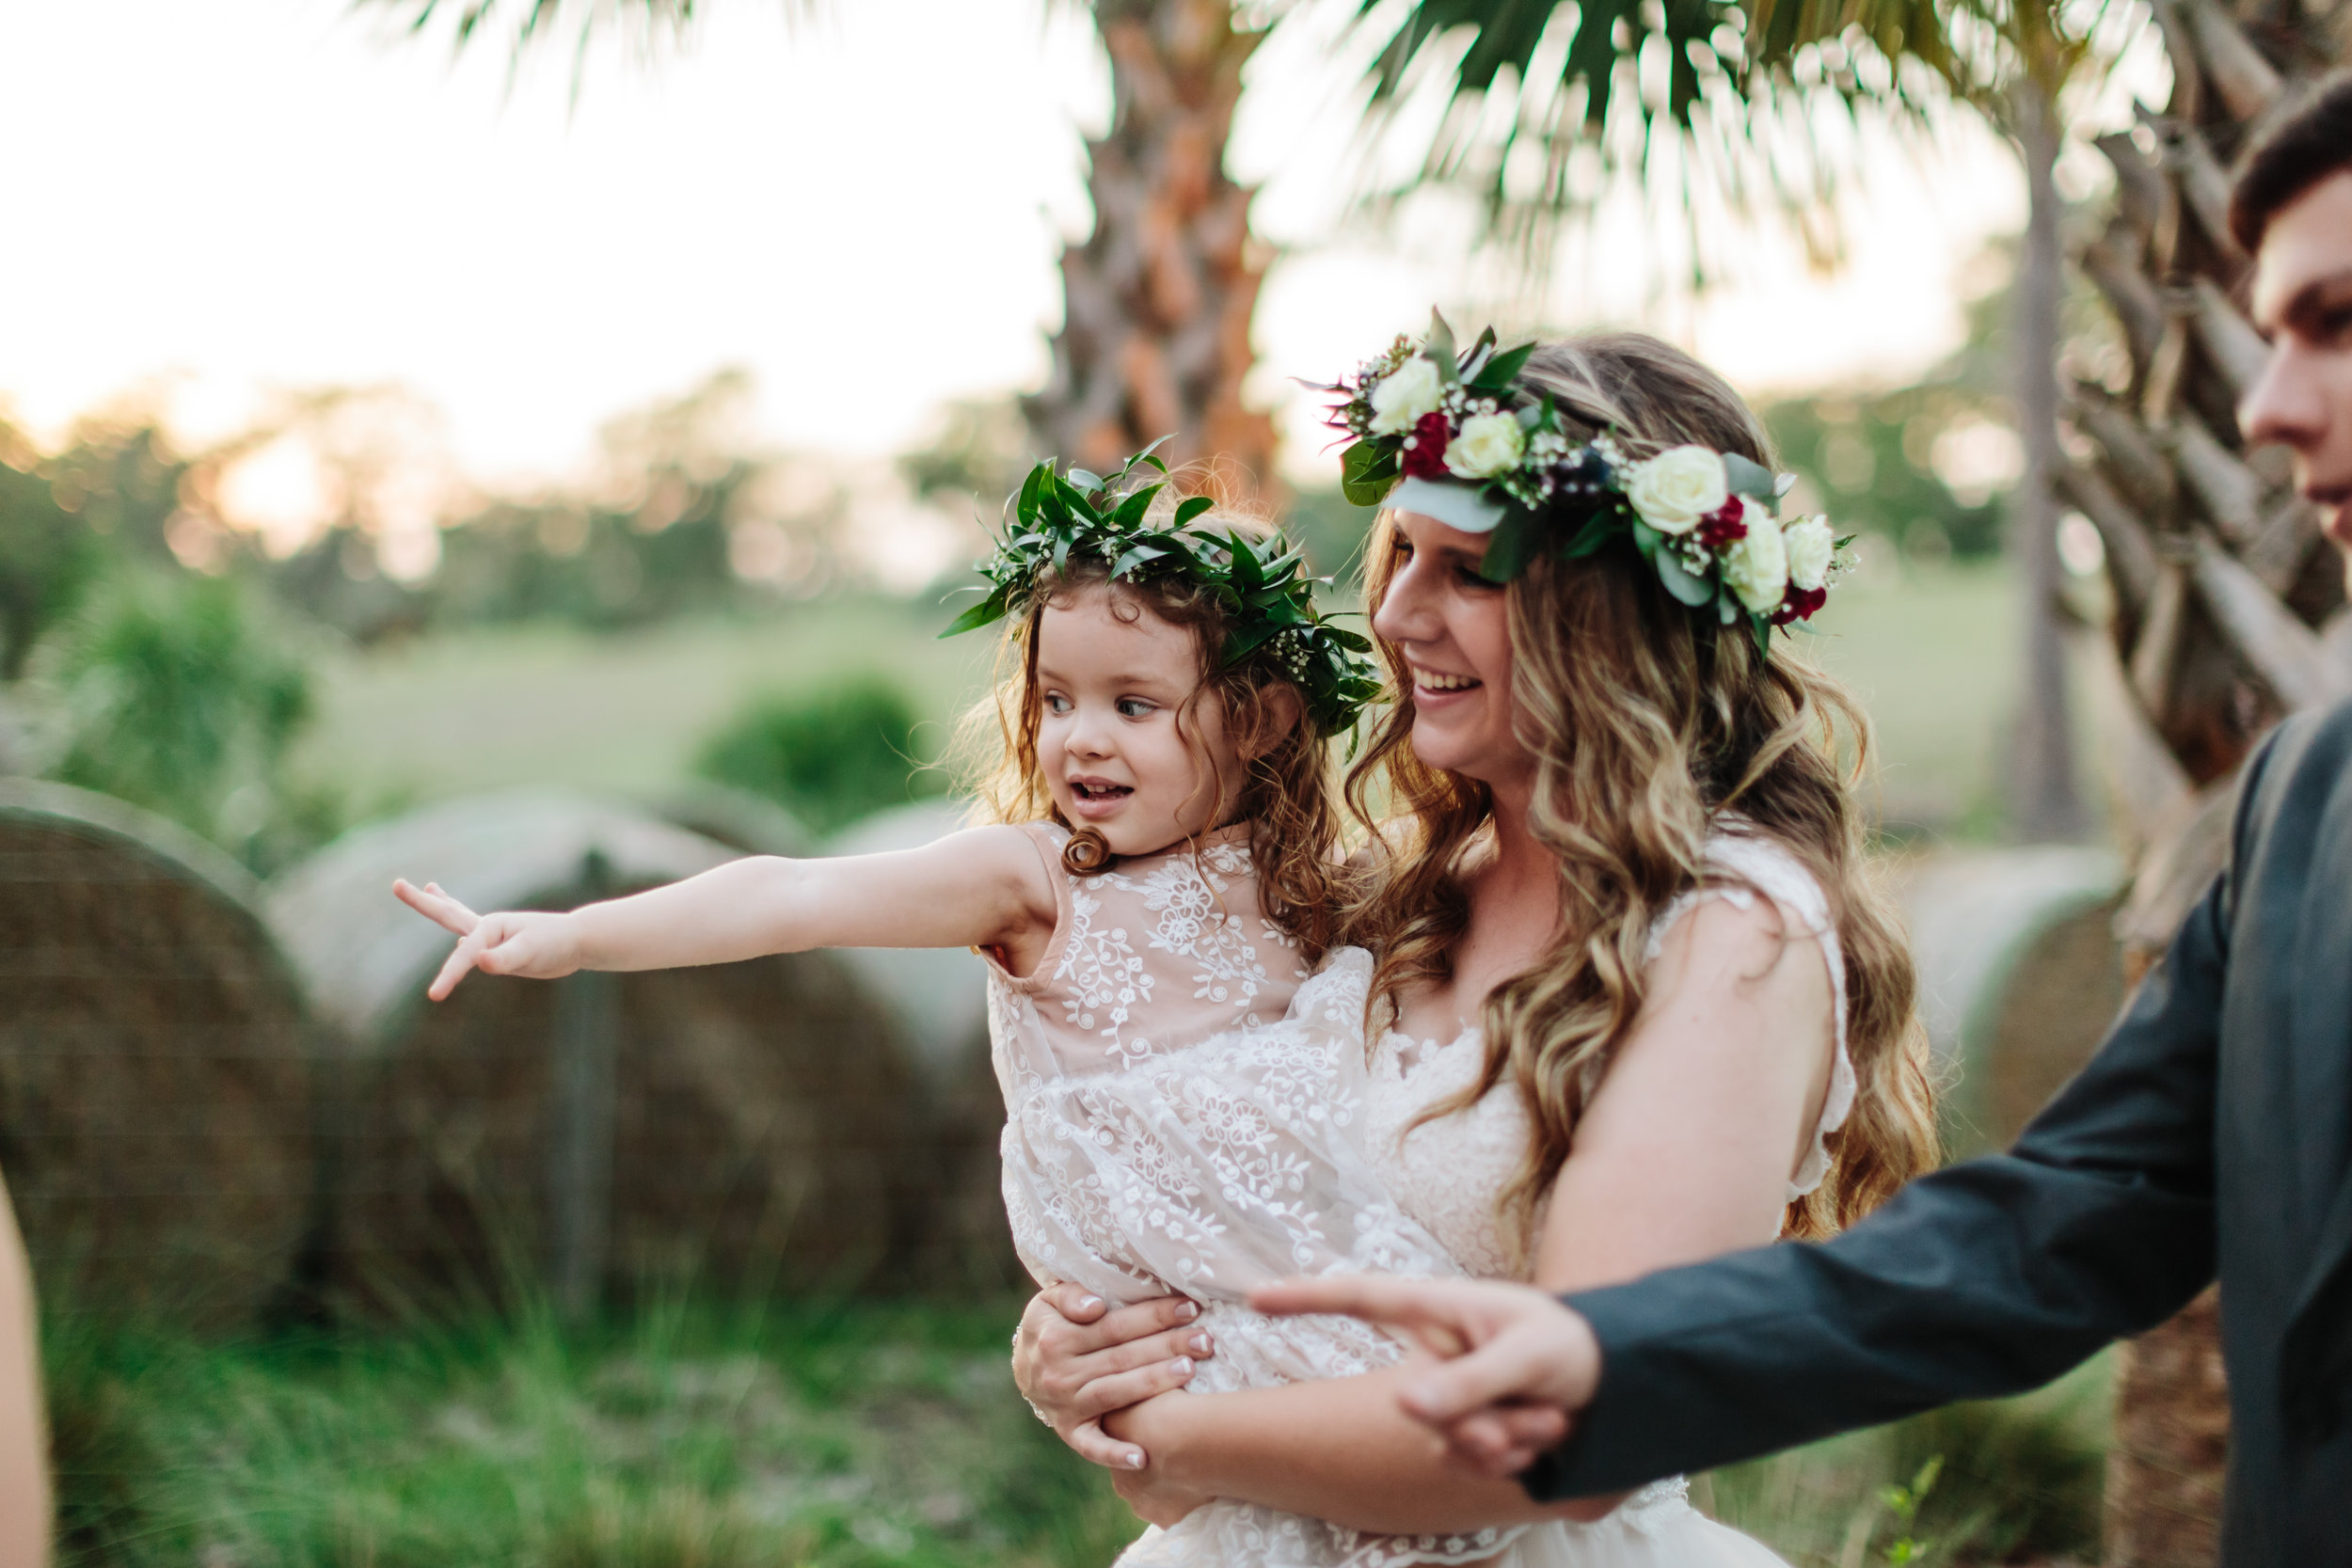 2018.04.14 Zak and Jamisyn Unrue Black Willow Barn Wedding Finals-808.jpg